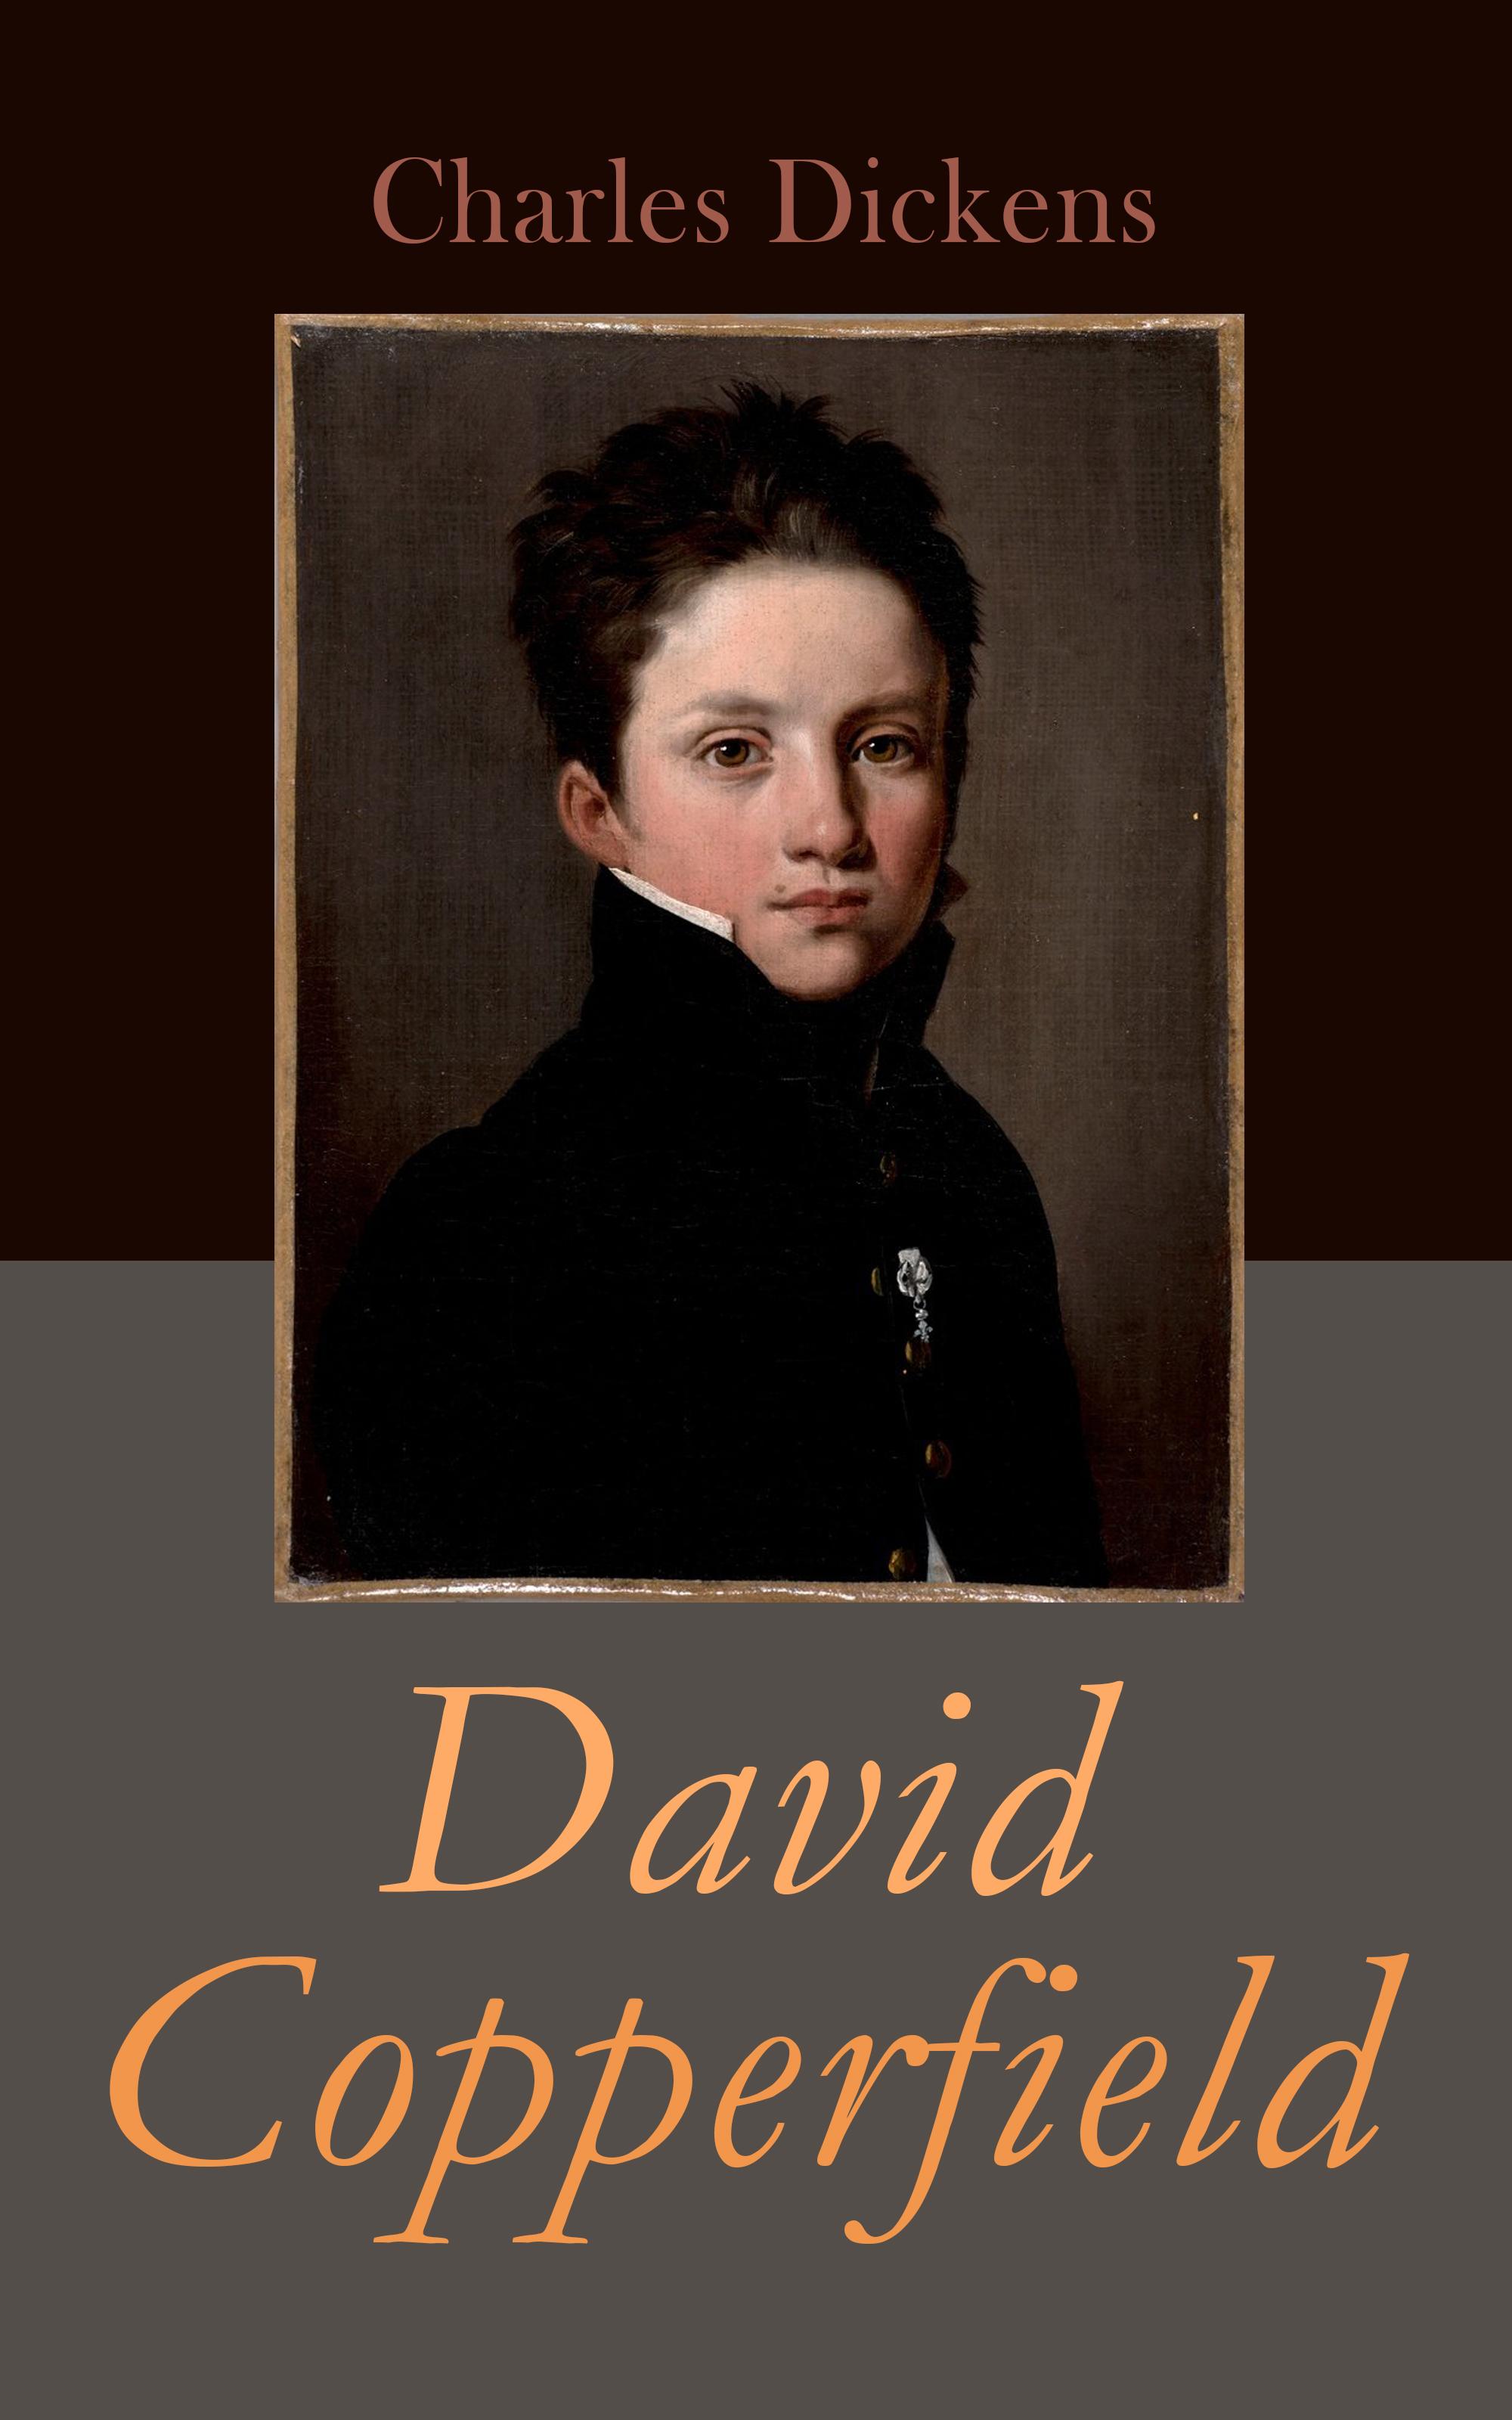 Чарльз Диккенс David Copperfield charles dickens the life and adventures of martin chuzzlewit volume ii